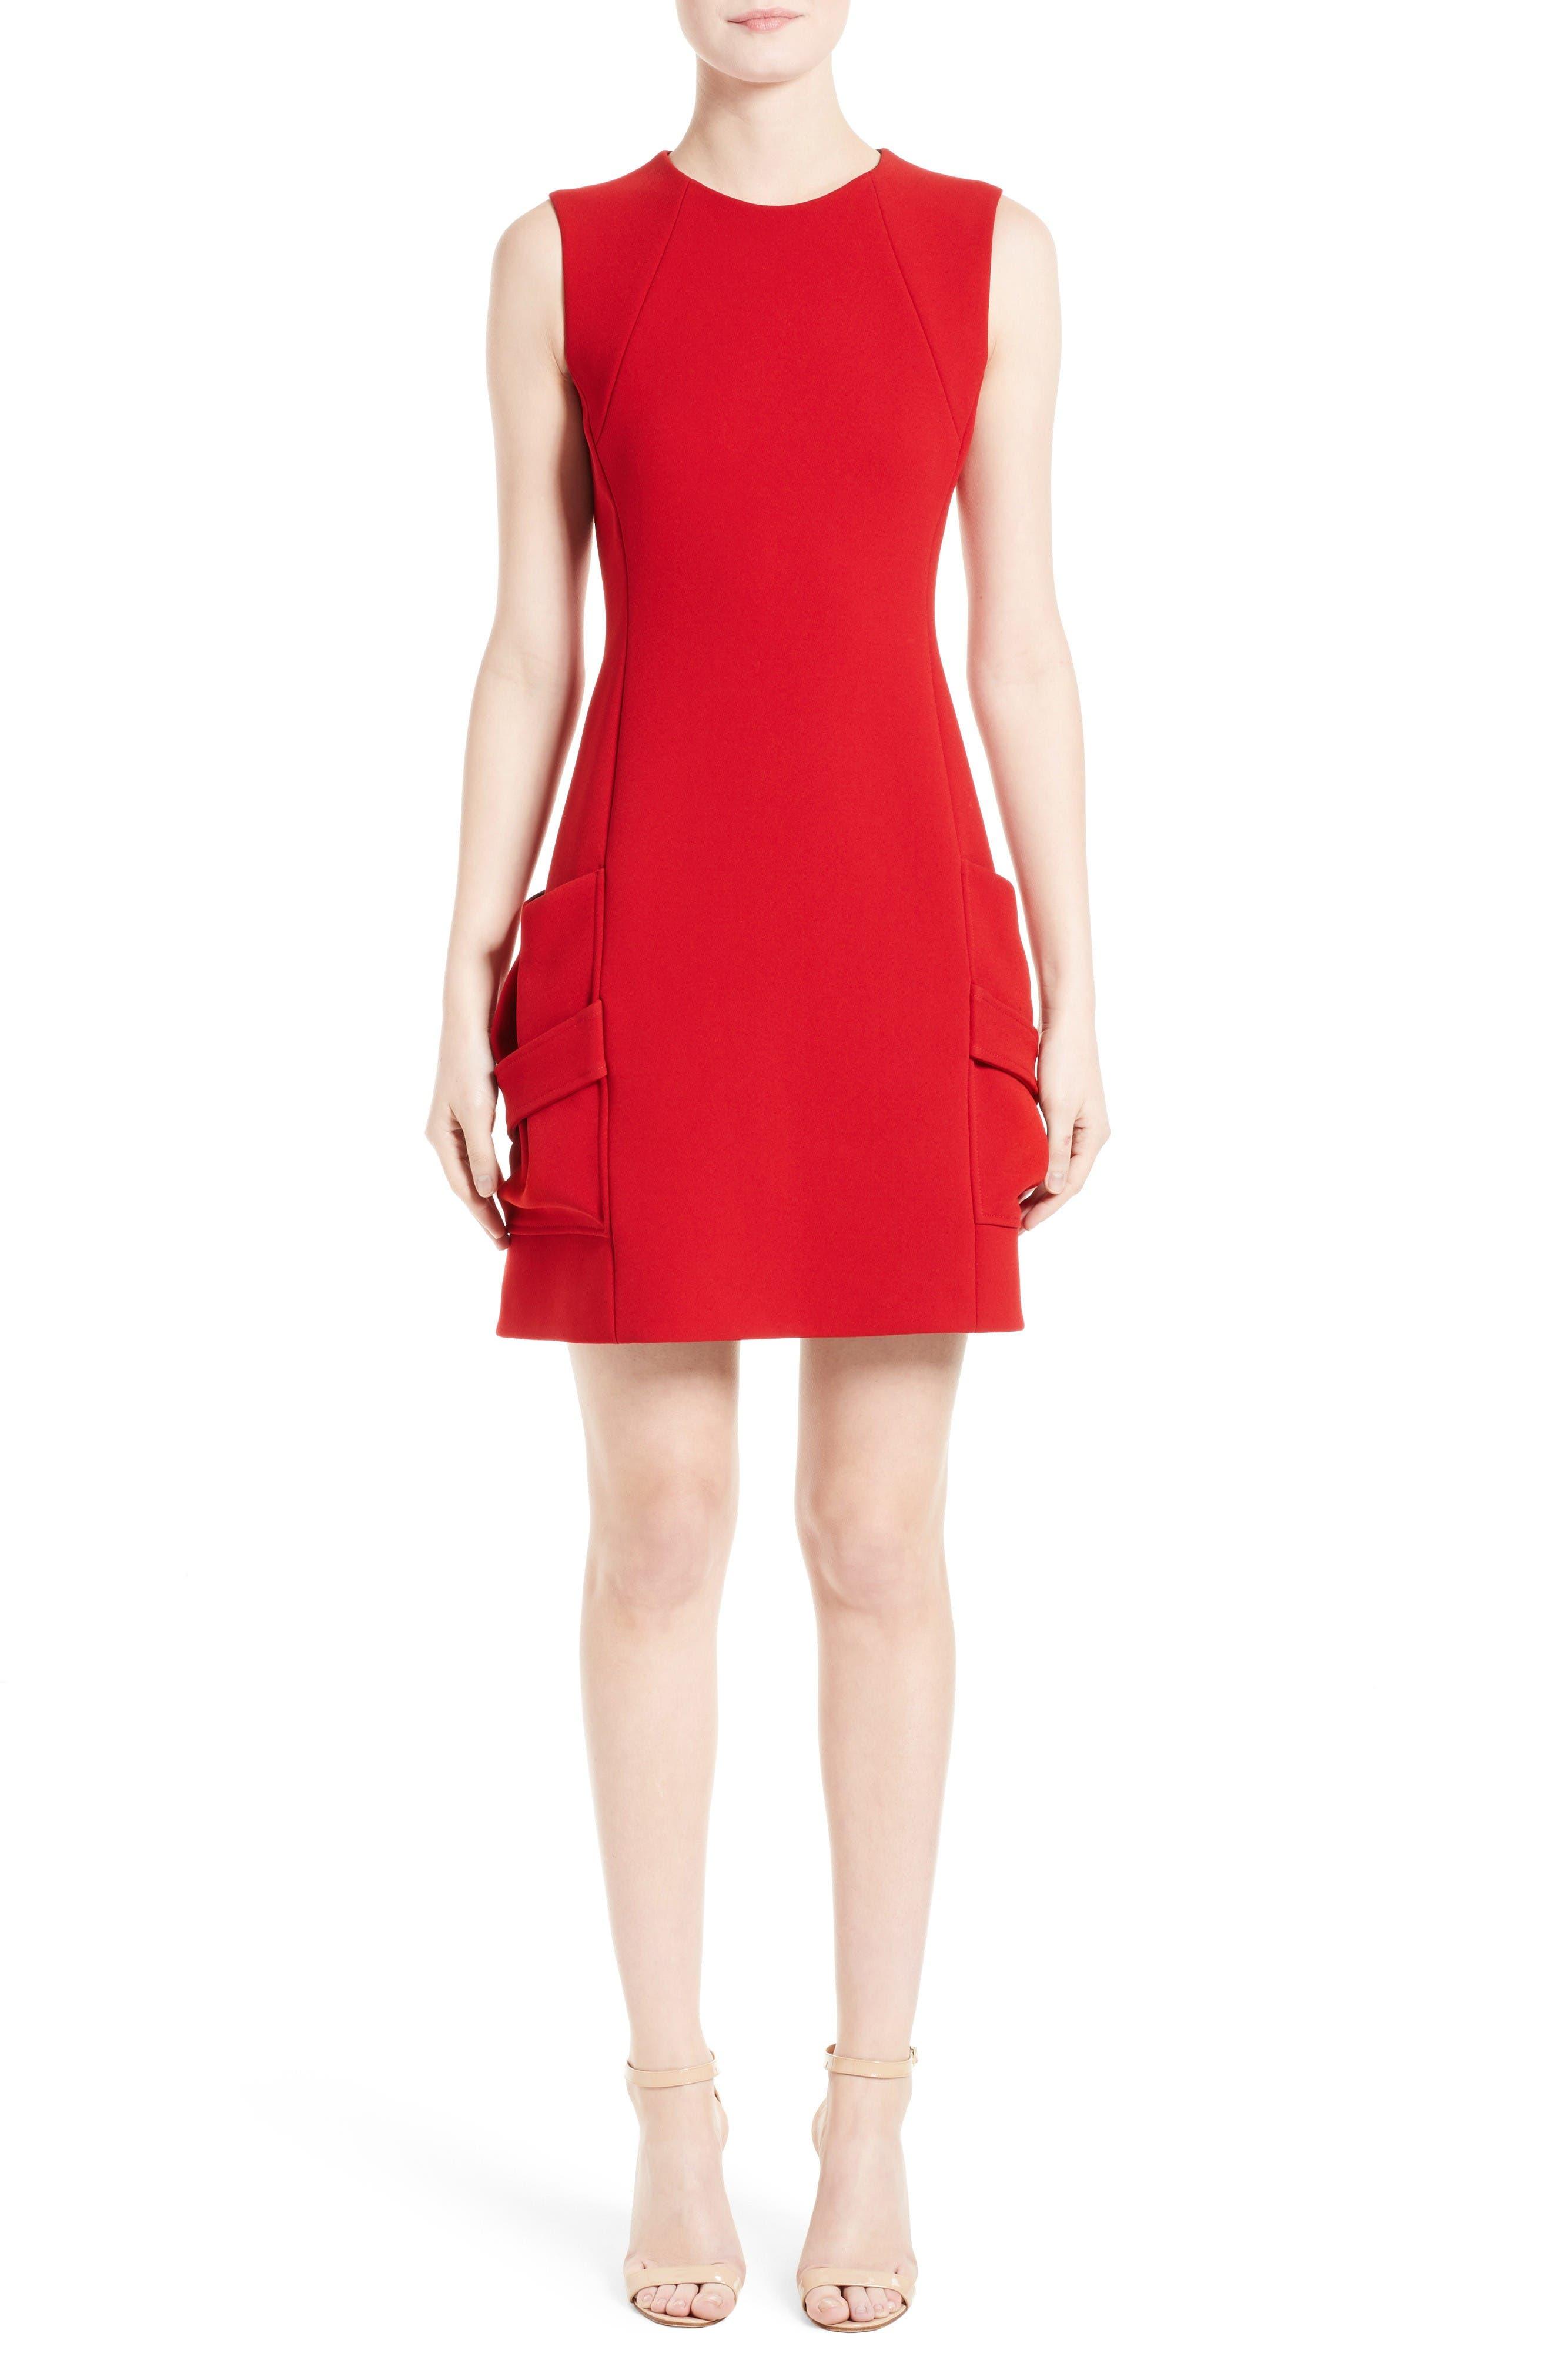 Victoria Beckham Crepe Minidress